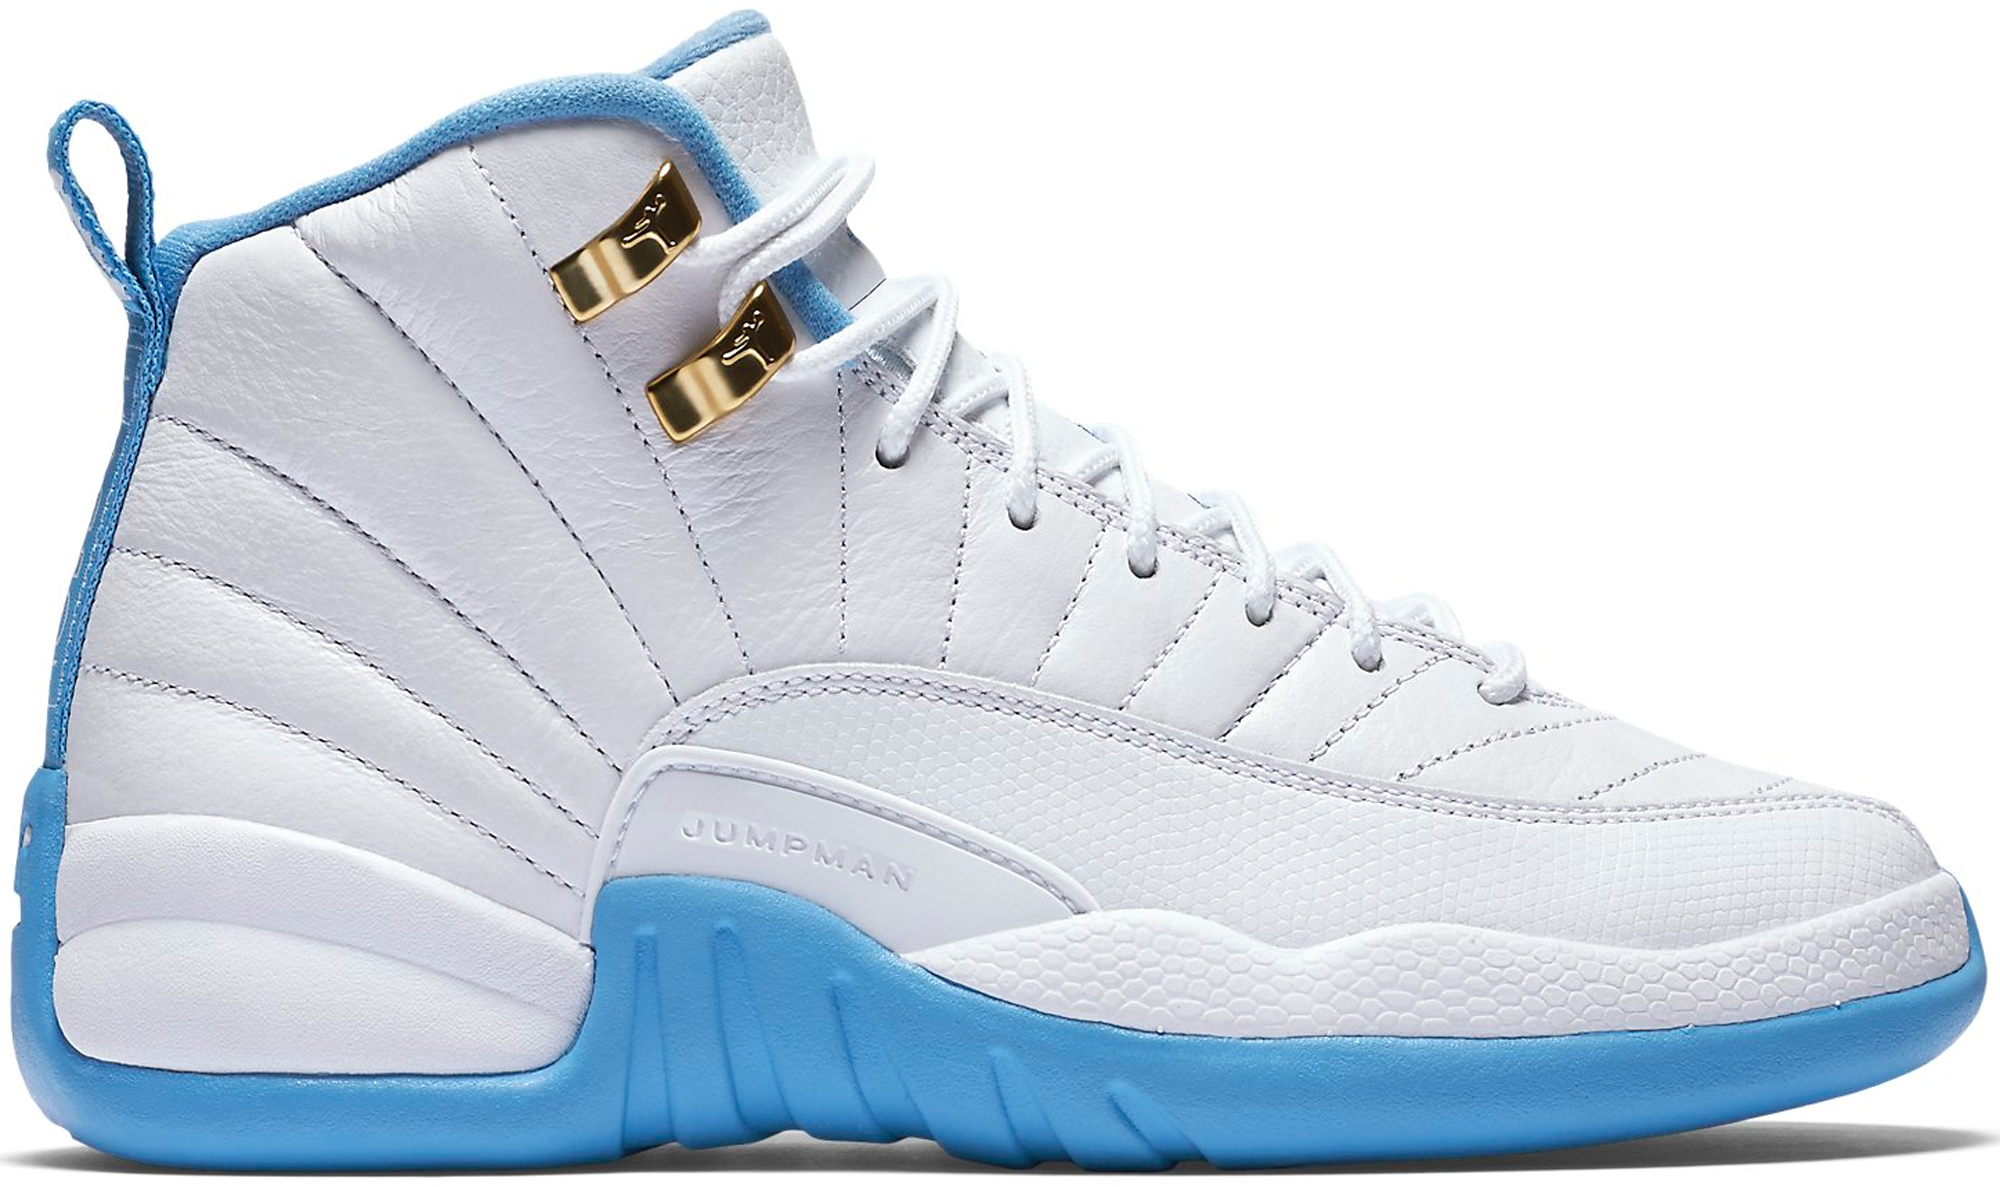 Jordan 12 Retro University Blue (GS) (2016)